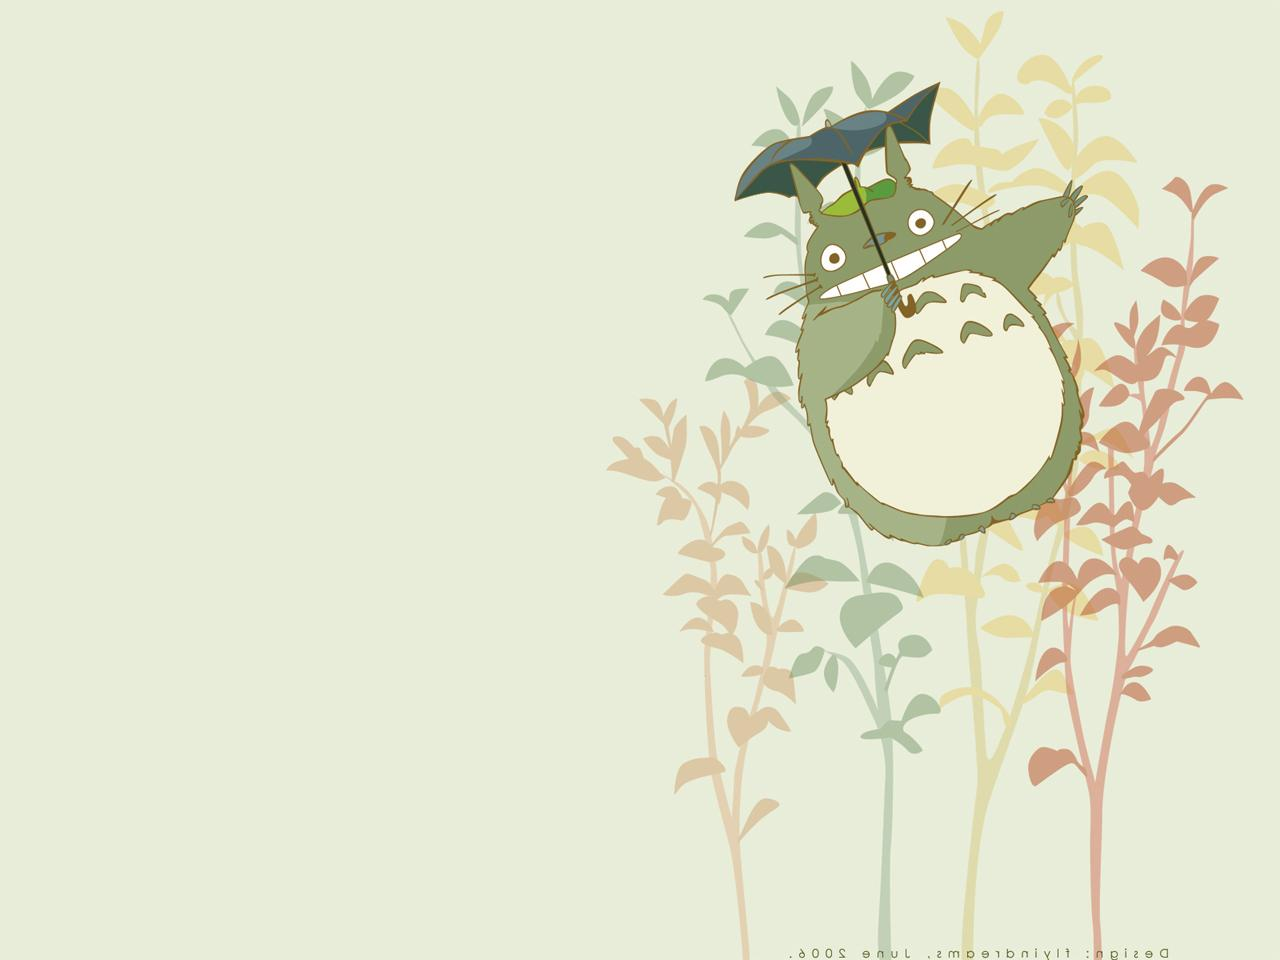 Anime Wallpapers My Neighbor Totoro Wallpaper